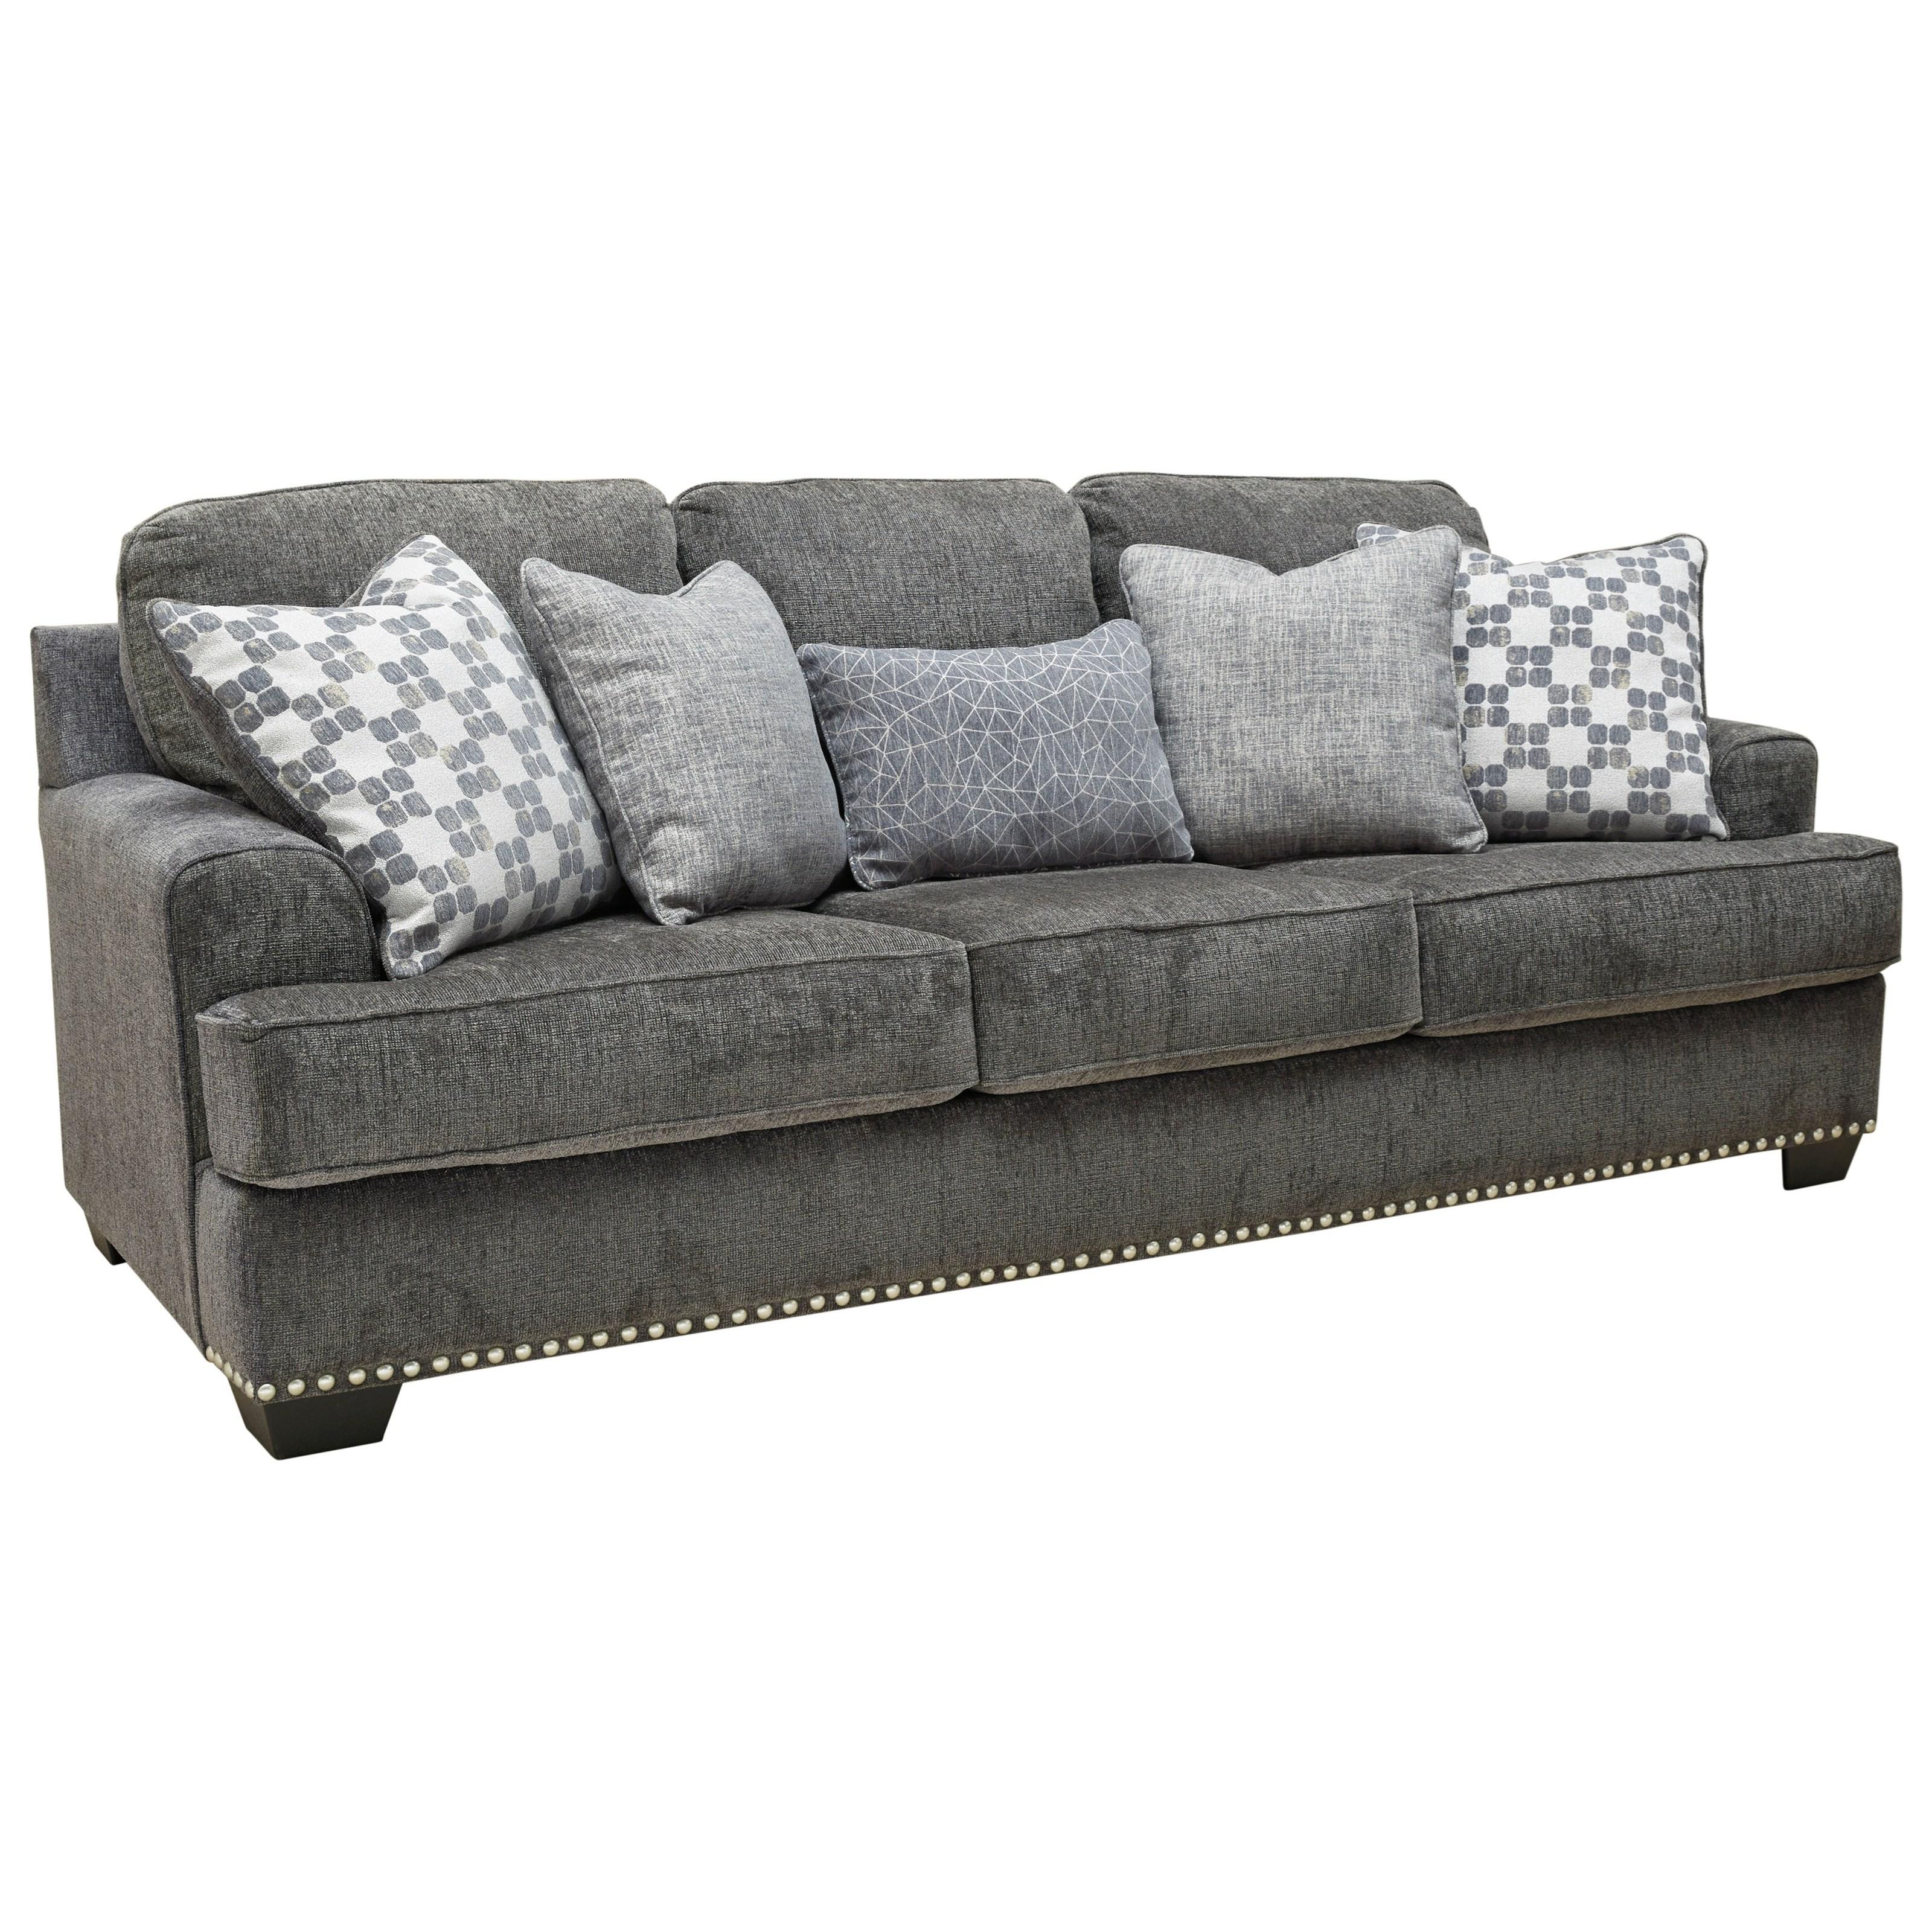 Locklin Sofa by Benchcraft at Walker's Furniture